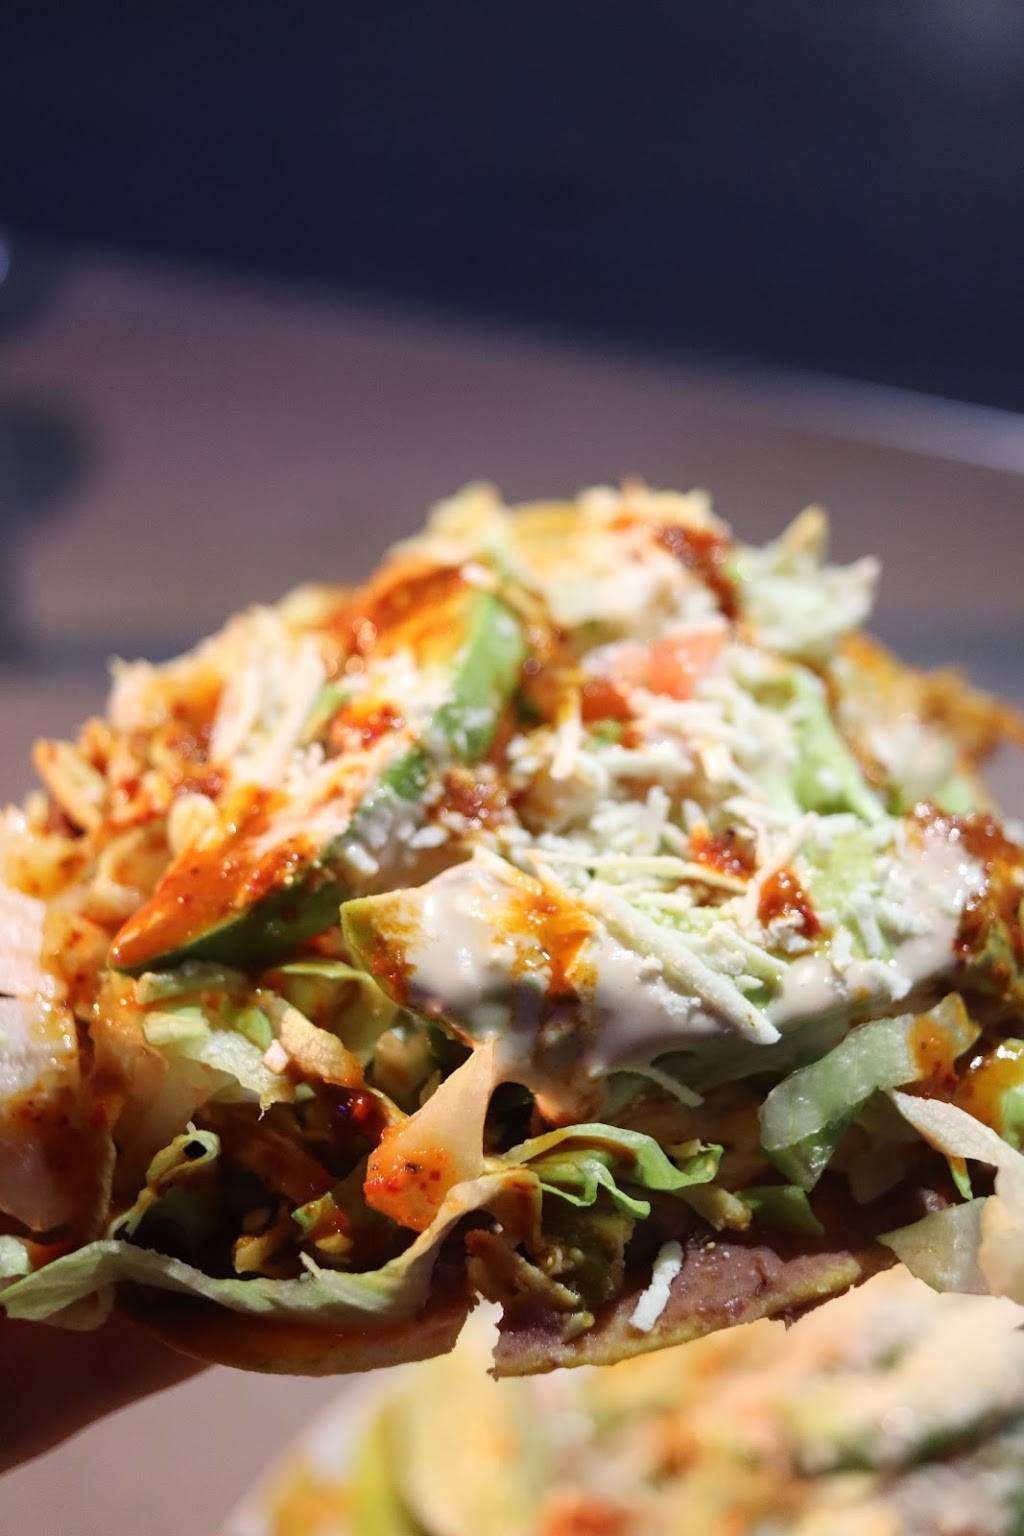 El Nene Latin Food   restaurant   2101 West St, Annapolis, MD 21401, USA   2405157487 OR +1 240-515-7487